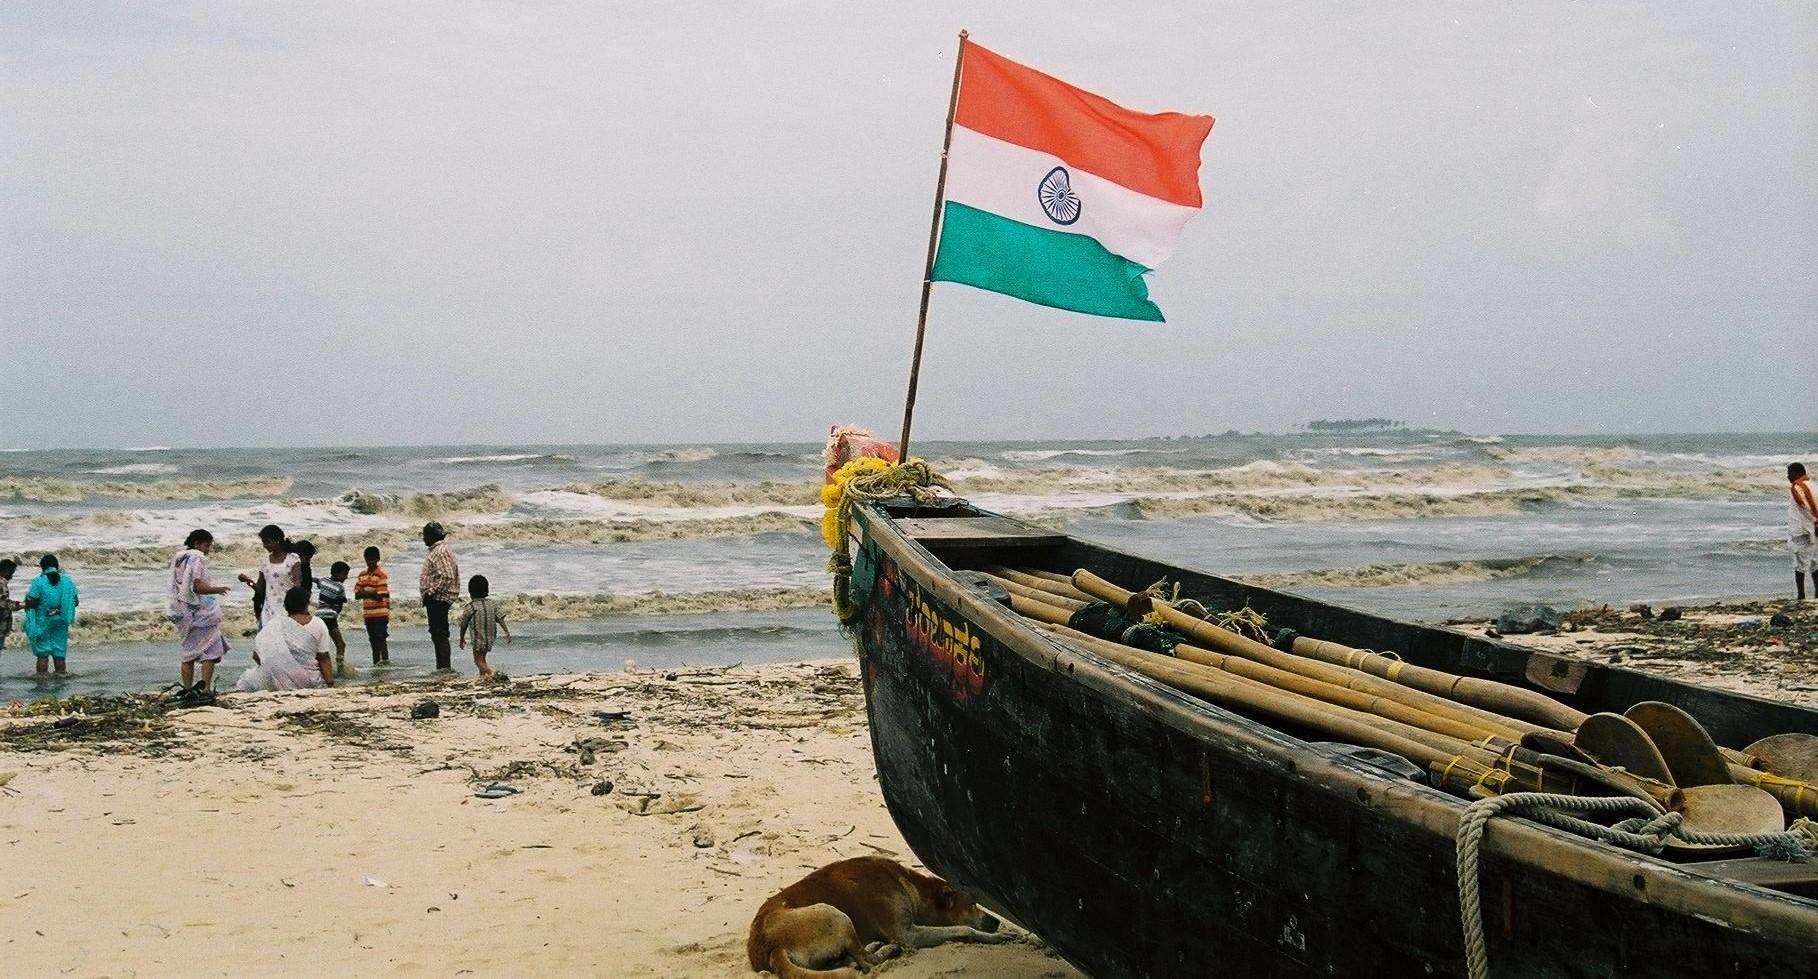 Photo: Flickr/Ankur Gupta